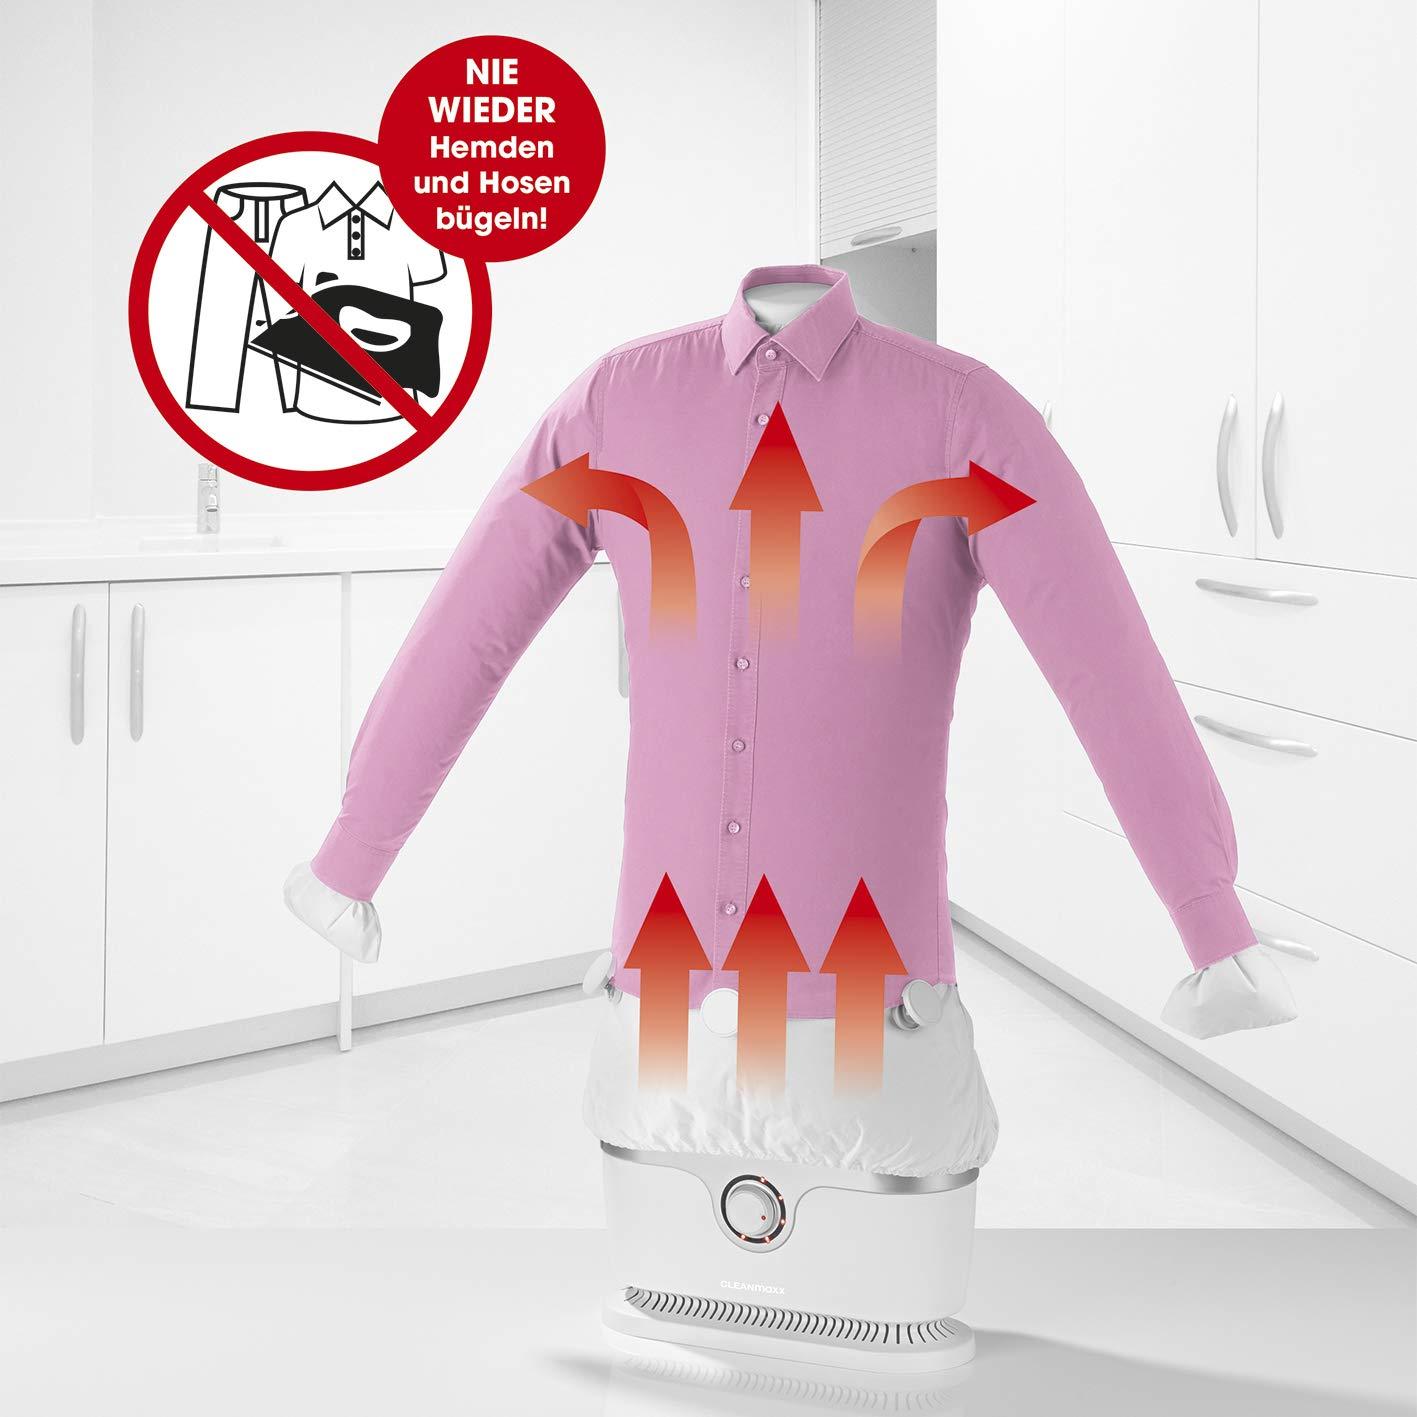 Planchador automático para camisas CLEANmaxx | Planchador para camisas y blusas, planchador automático | Bastidor de planchado con dos programas de ...